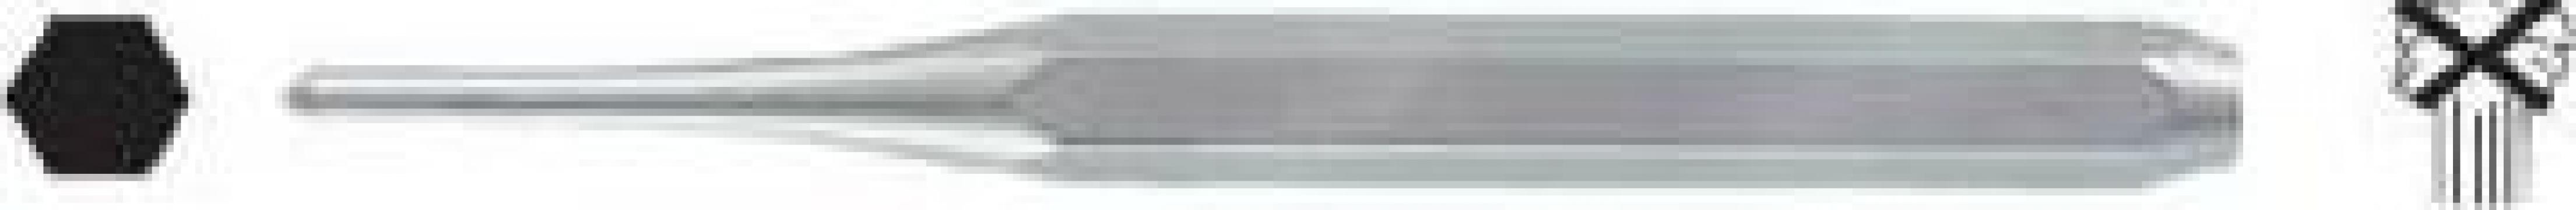 Punctator U 368 8228-019 de la Nascom Invest